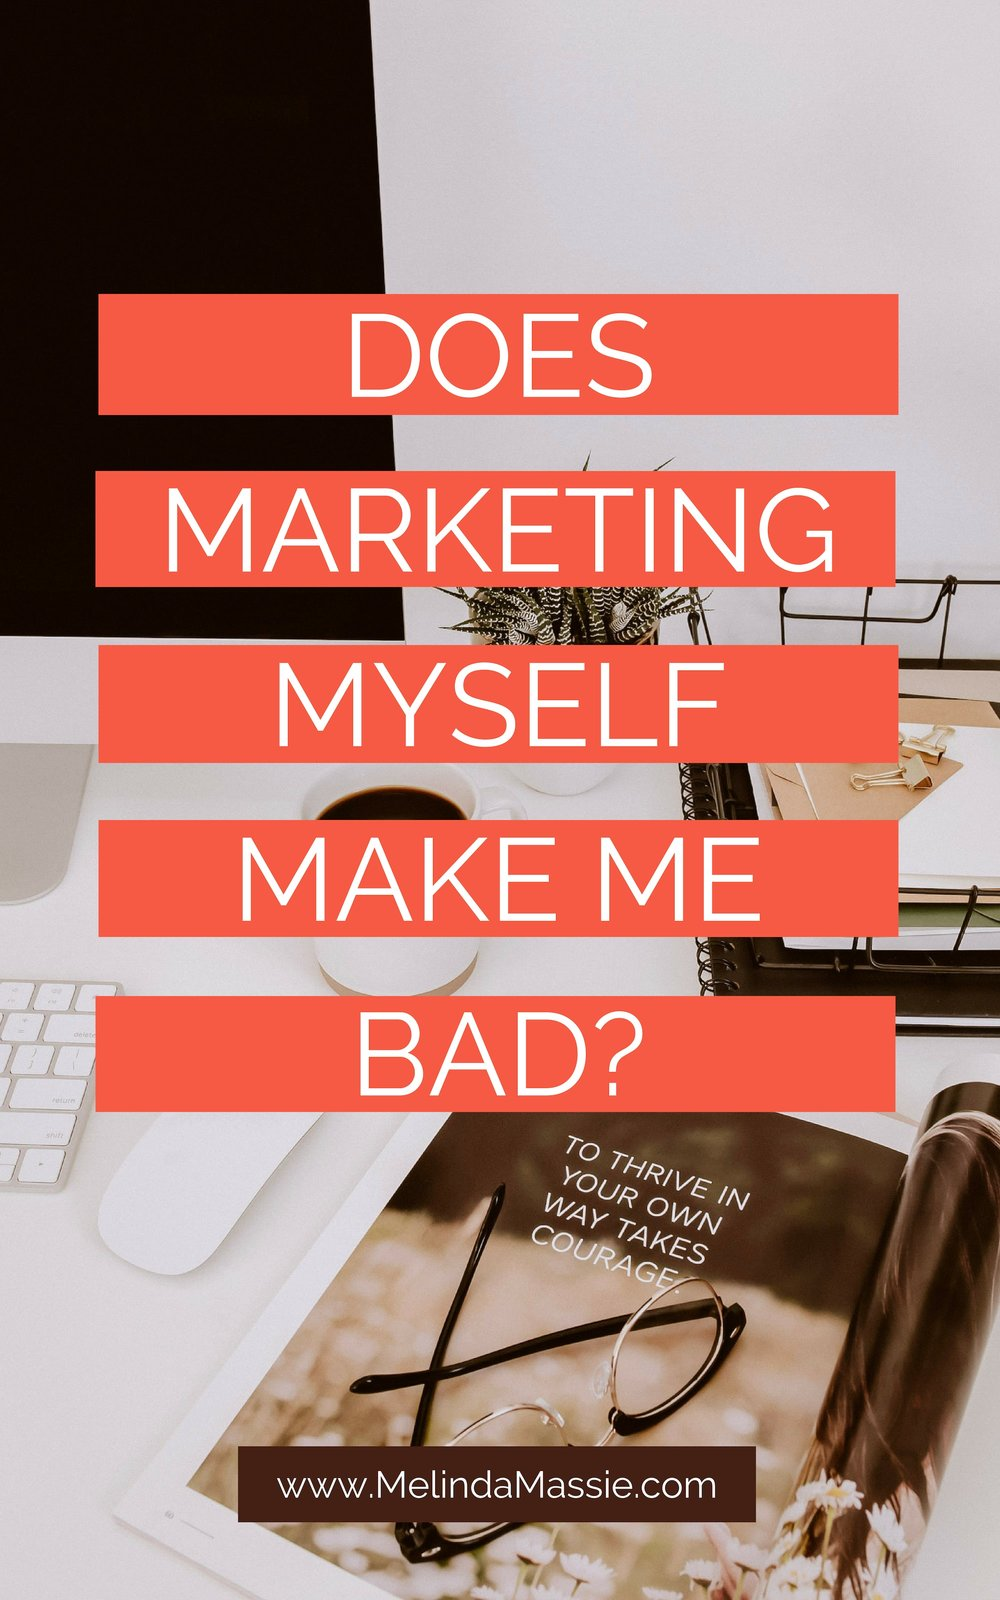 Does Marketing Myself Make Me Bad? - Melinda Massie Blog